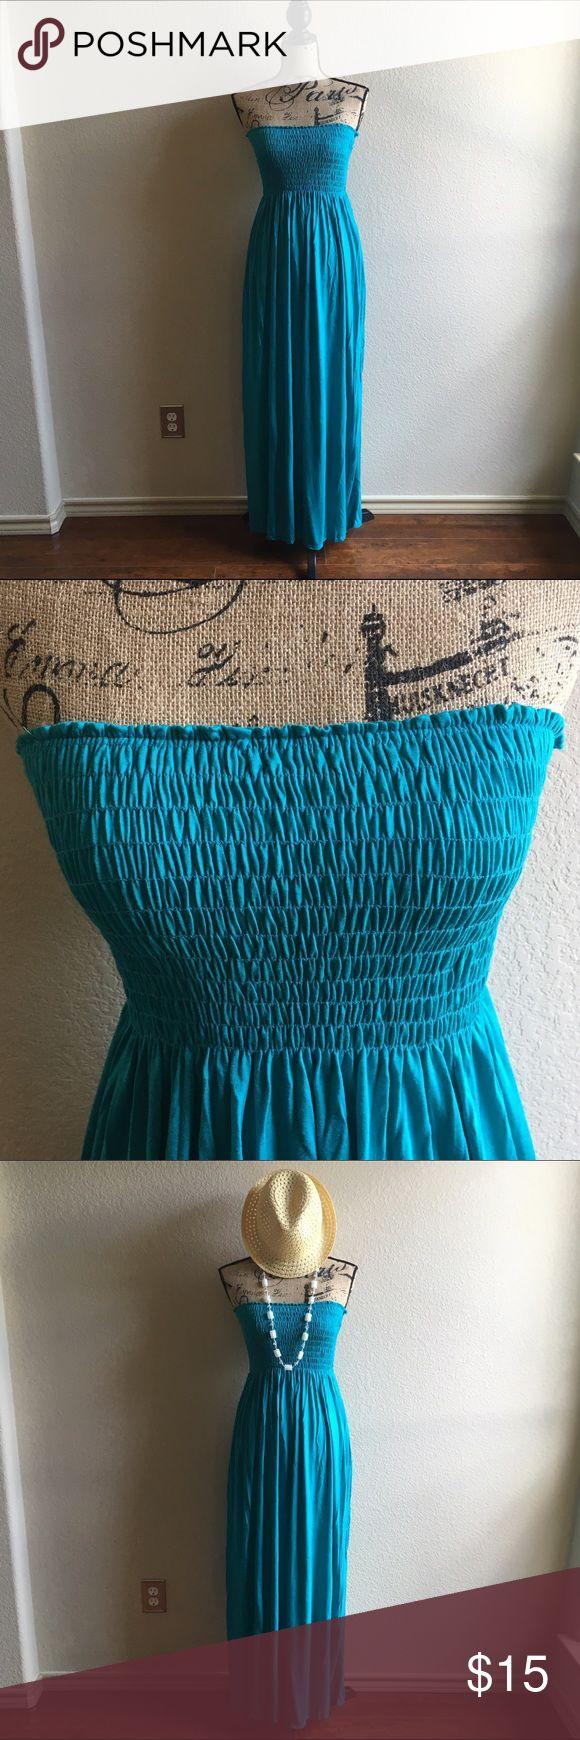 Selling this Teal Strapless Maxi Dress/Cover-Up on Poshmark! My username is: manda108. #shopmycloset #poshmark #fashion #shopping #style #forsale #Style Up #Dresses & Skirts